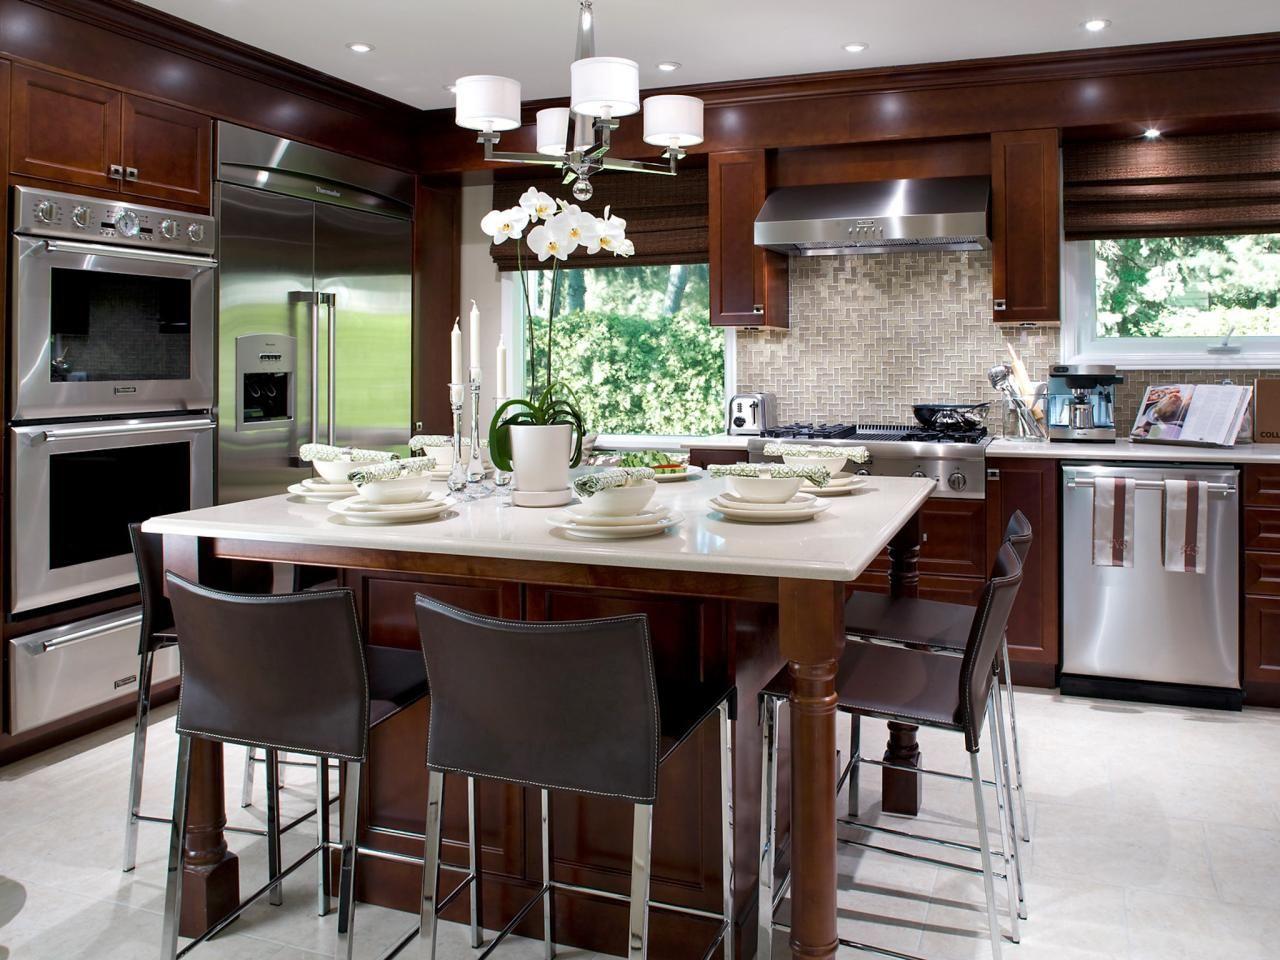 European Kitchen Design Pictures Ideas u0026 Tips